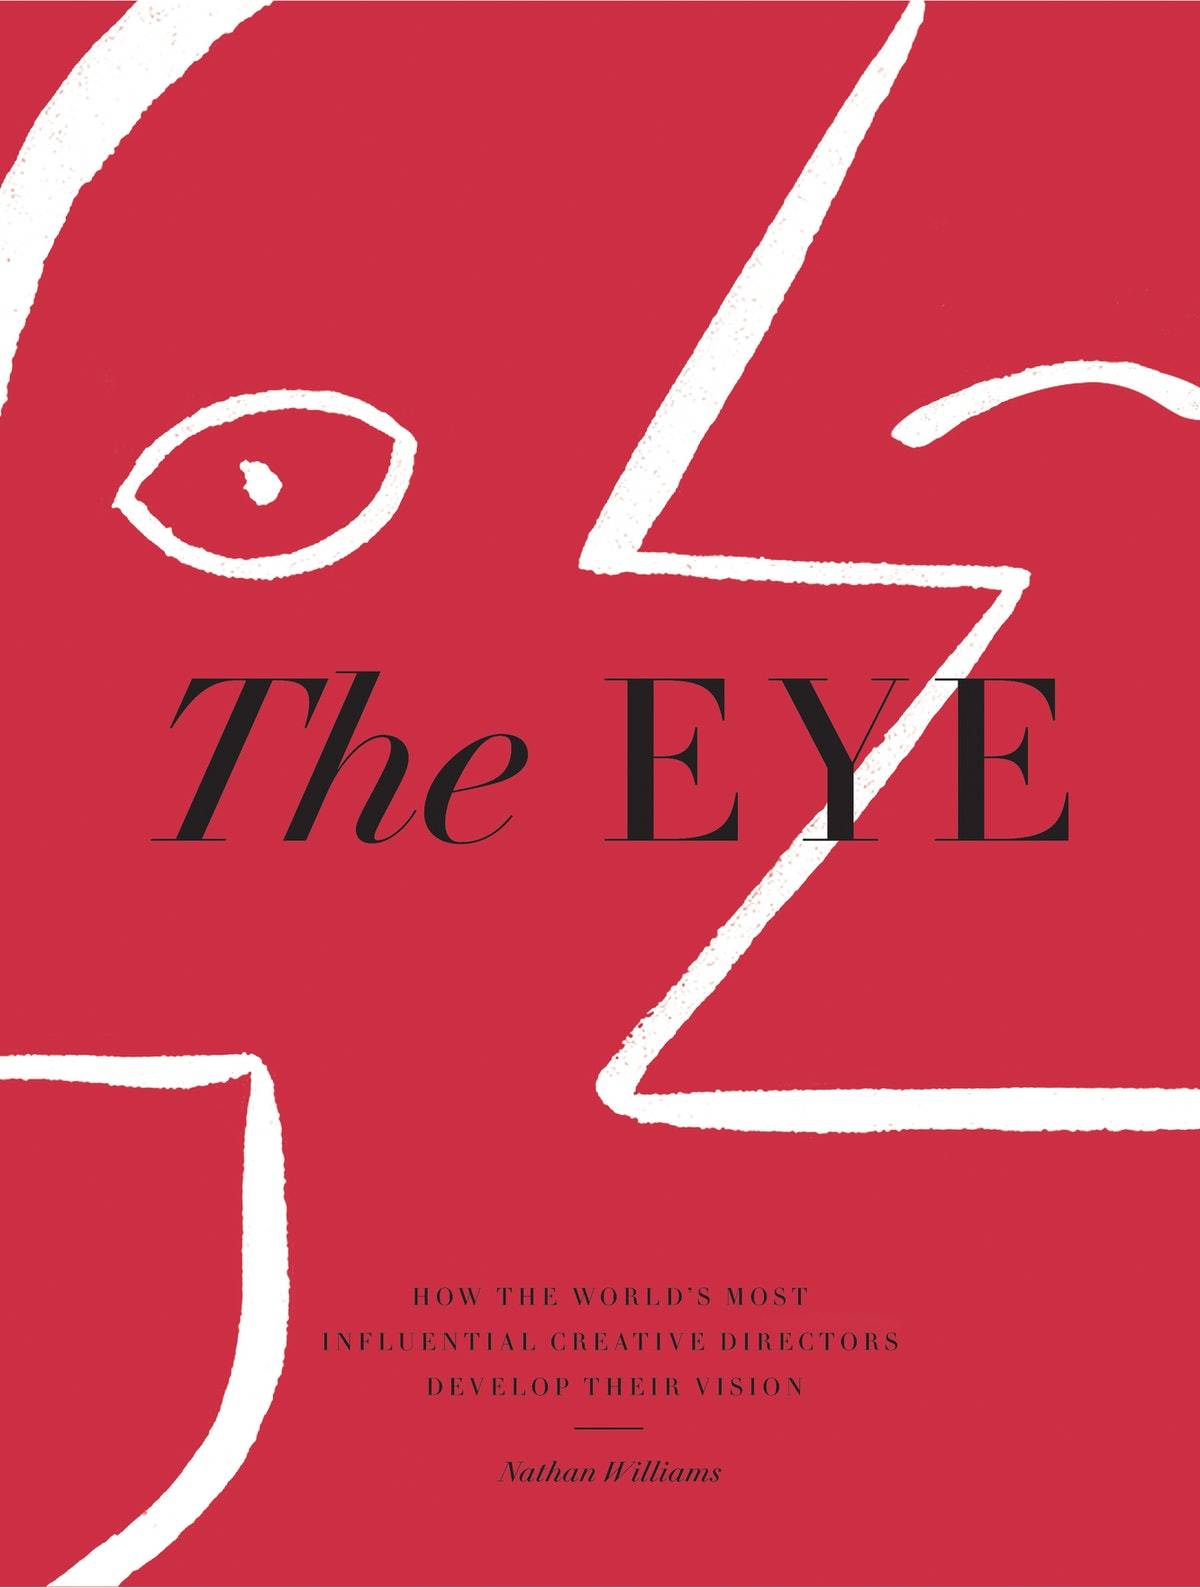 the-eye-nathan-walker-book.jpg